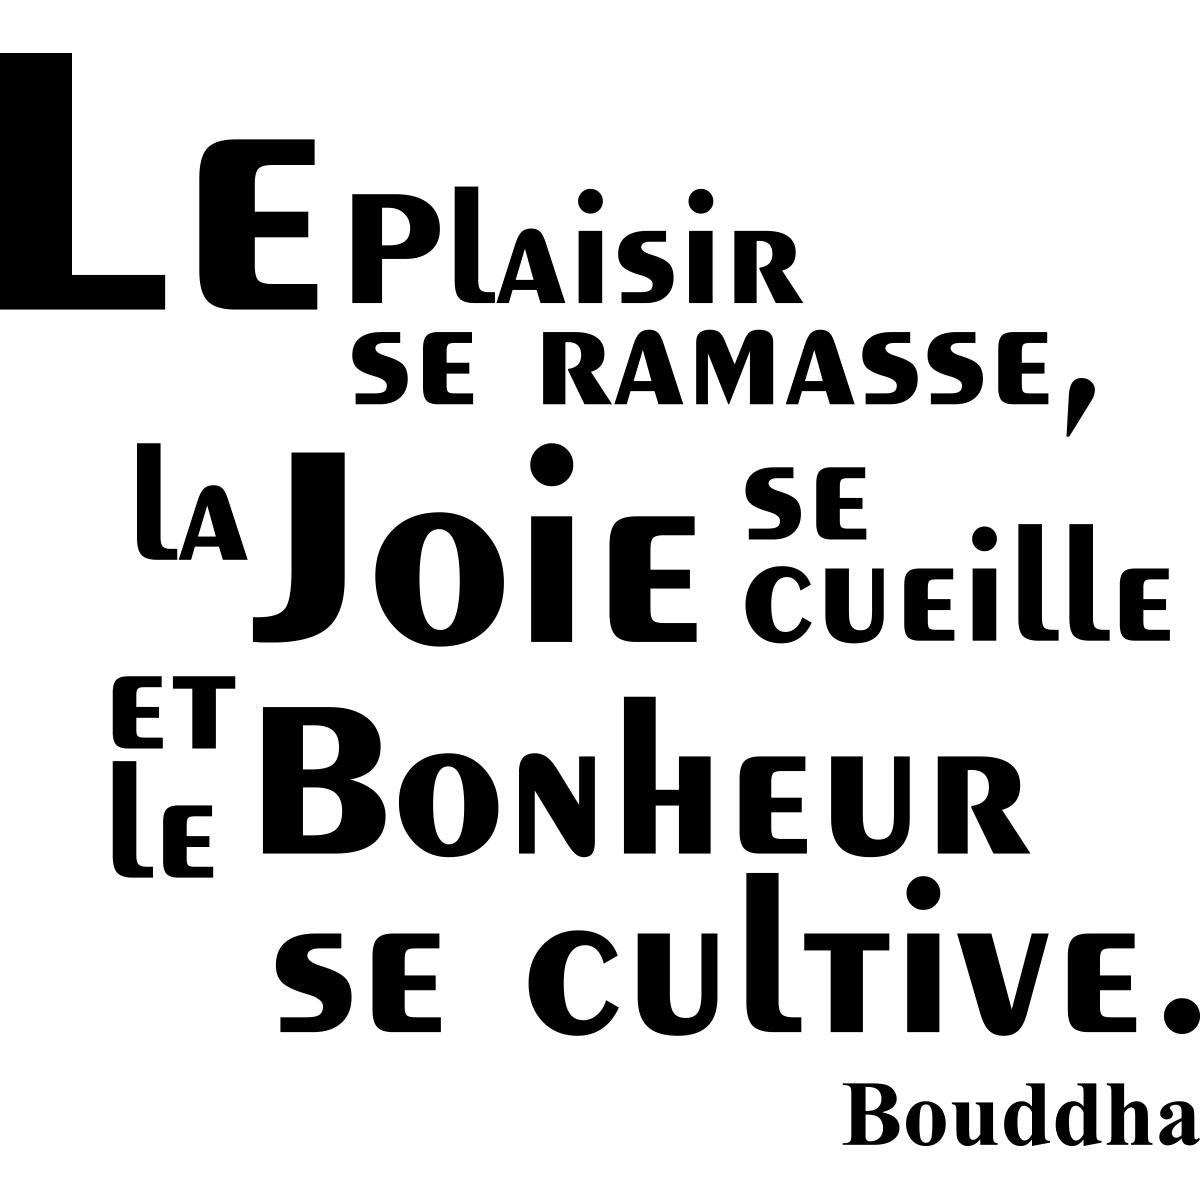 Sticker Citation Le Plaisir Se Ramasse Bouddha